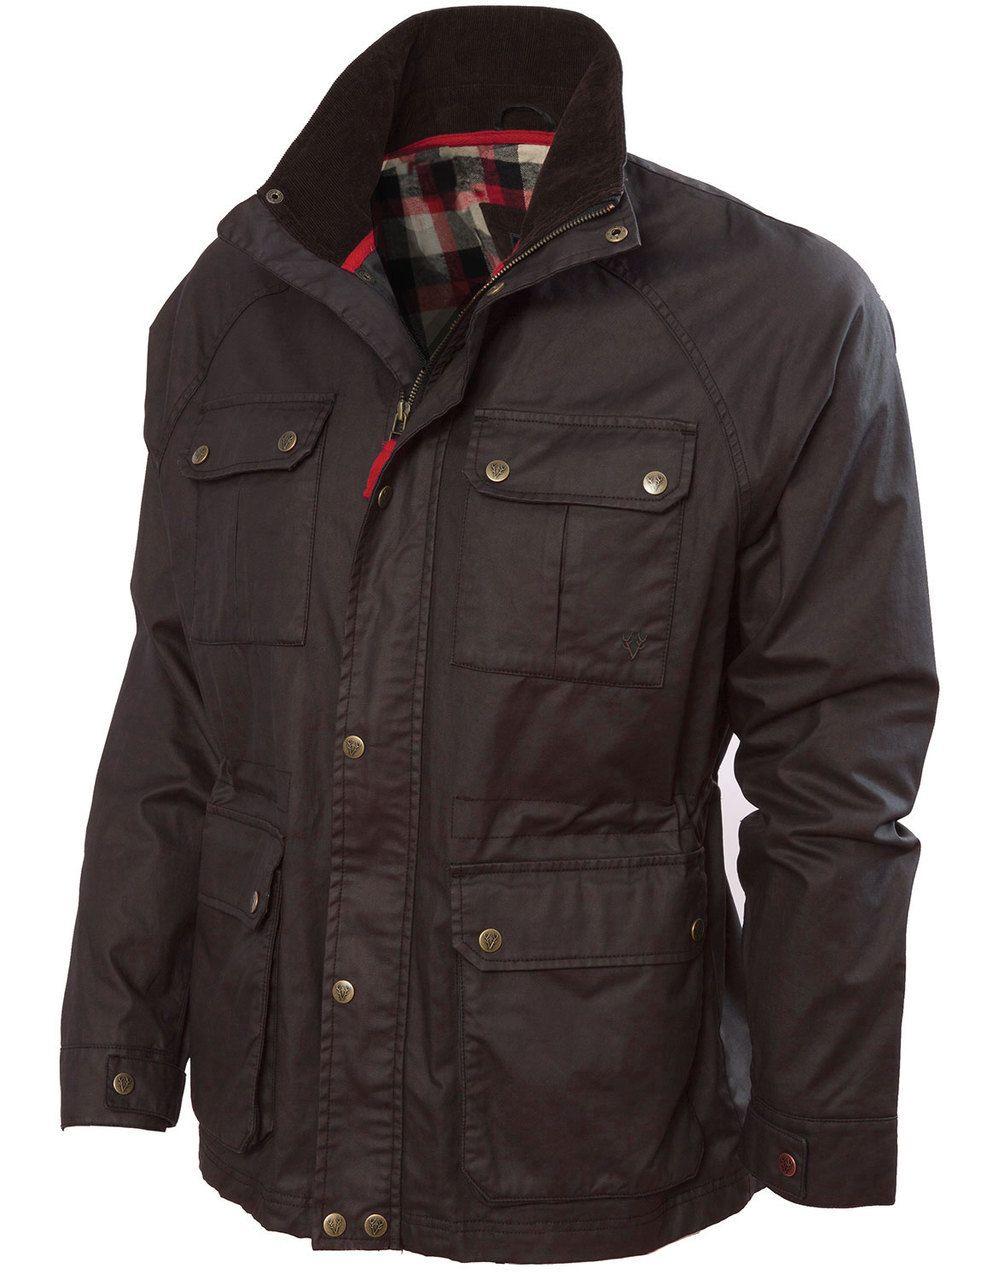 828674d090b Mens Wax Jacket (3050 Black) dry wax waxed coat biker country style ...